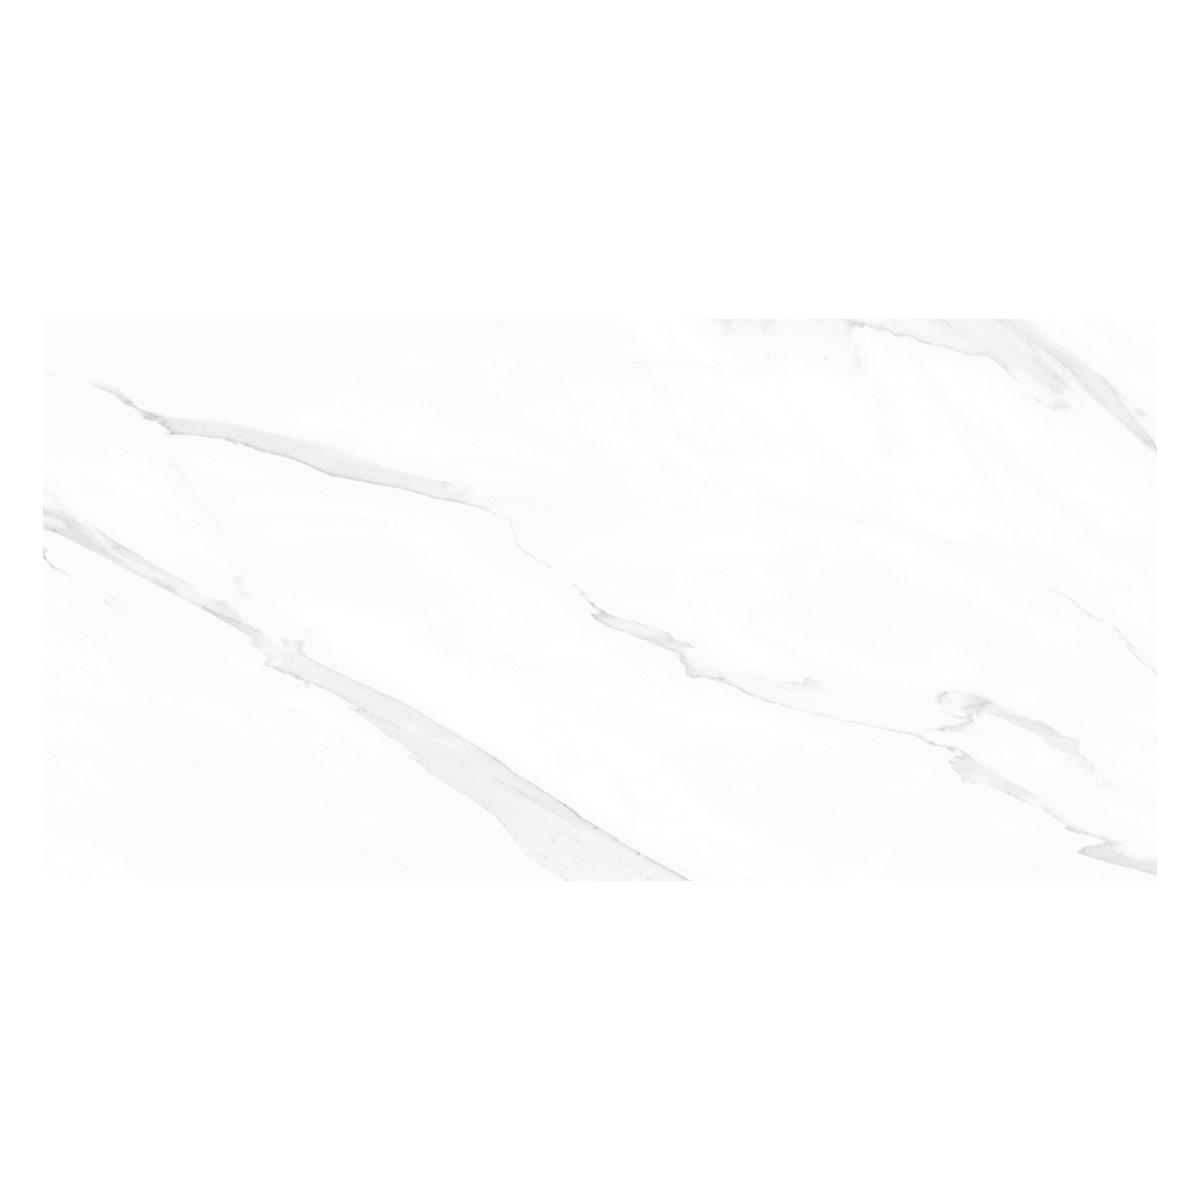 Porcelanato Luxury Blanco Brillante - 60X120 cm - 1.44 m2